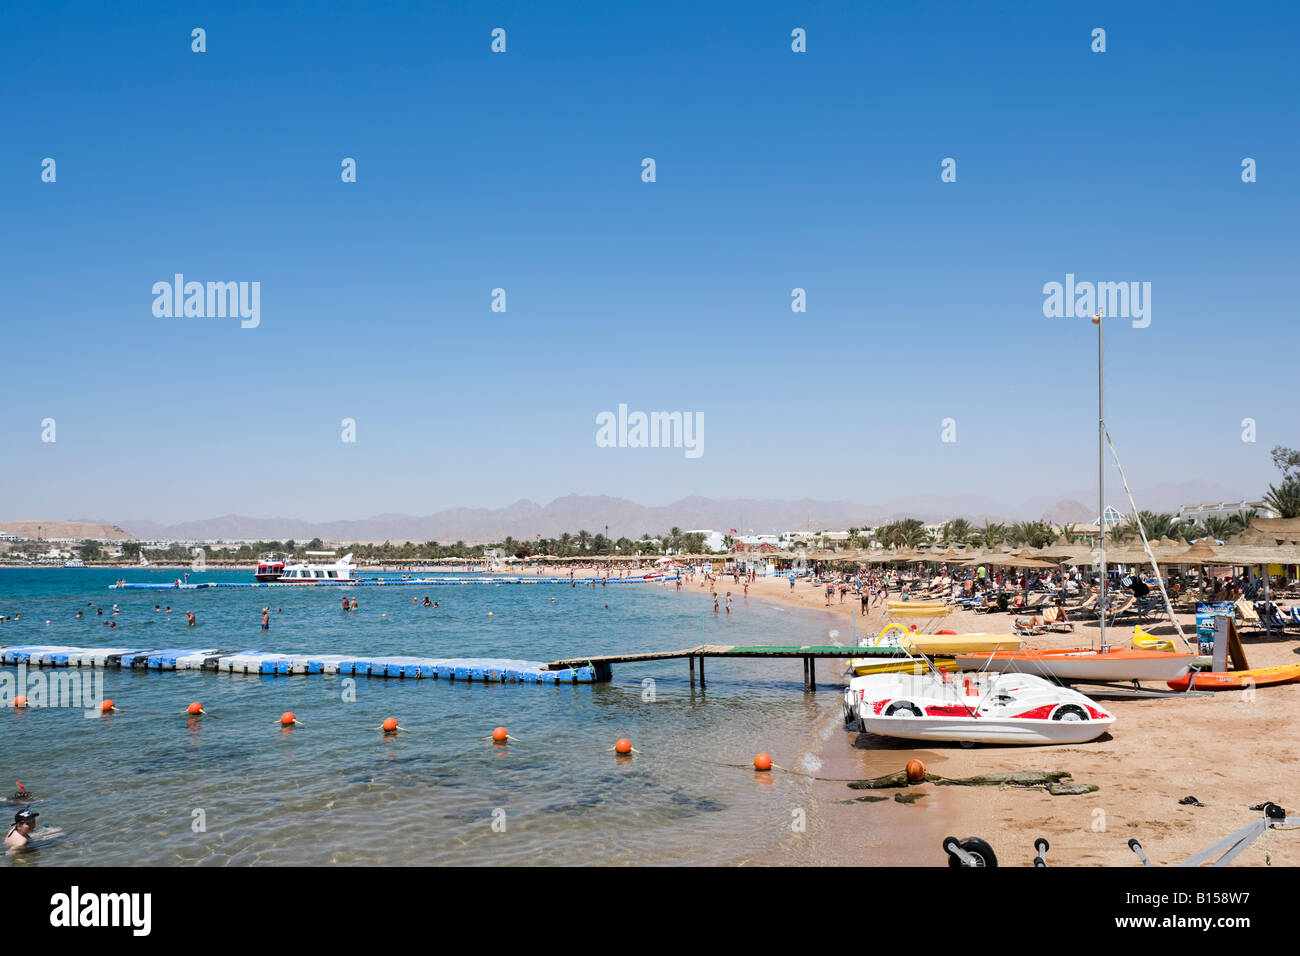 Naama Bay Beach, Sharm el-Sheikh, Red Sea Coast, South Sinai, Egypt - Stock Image